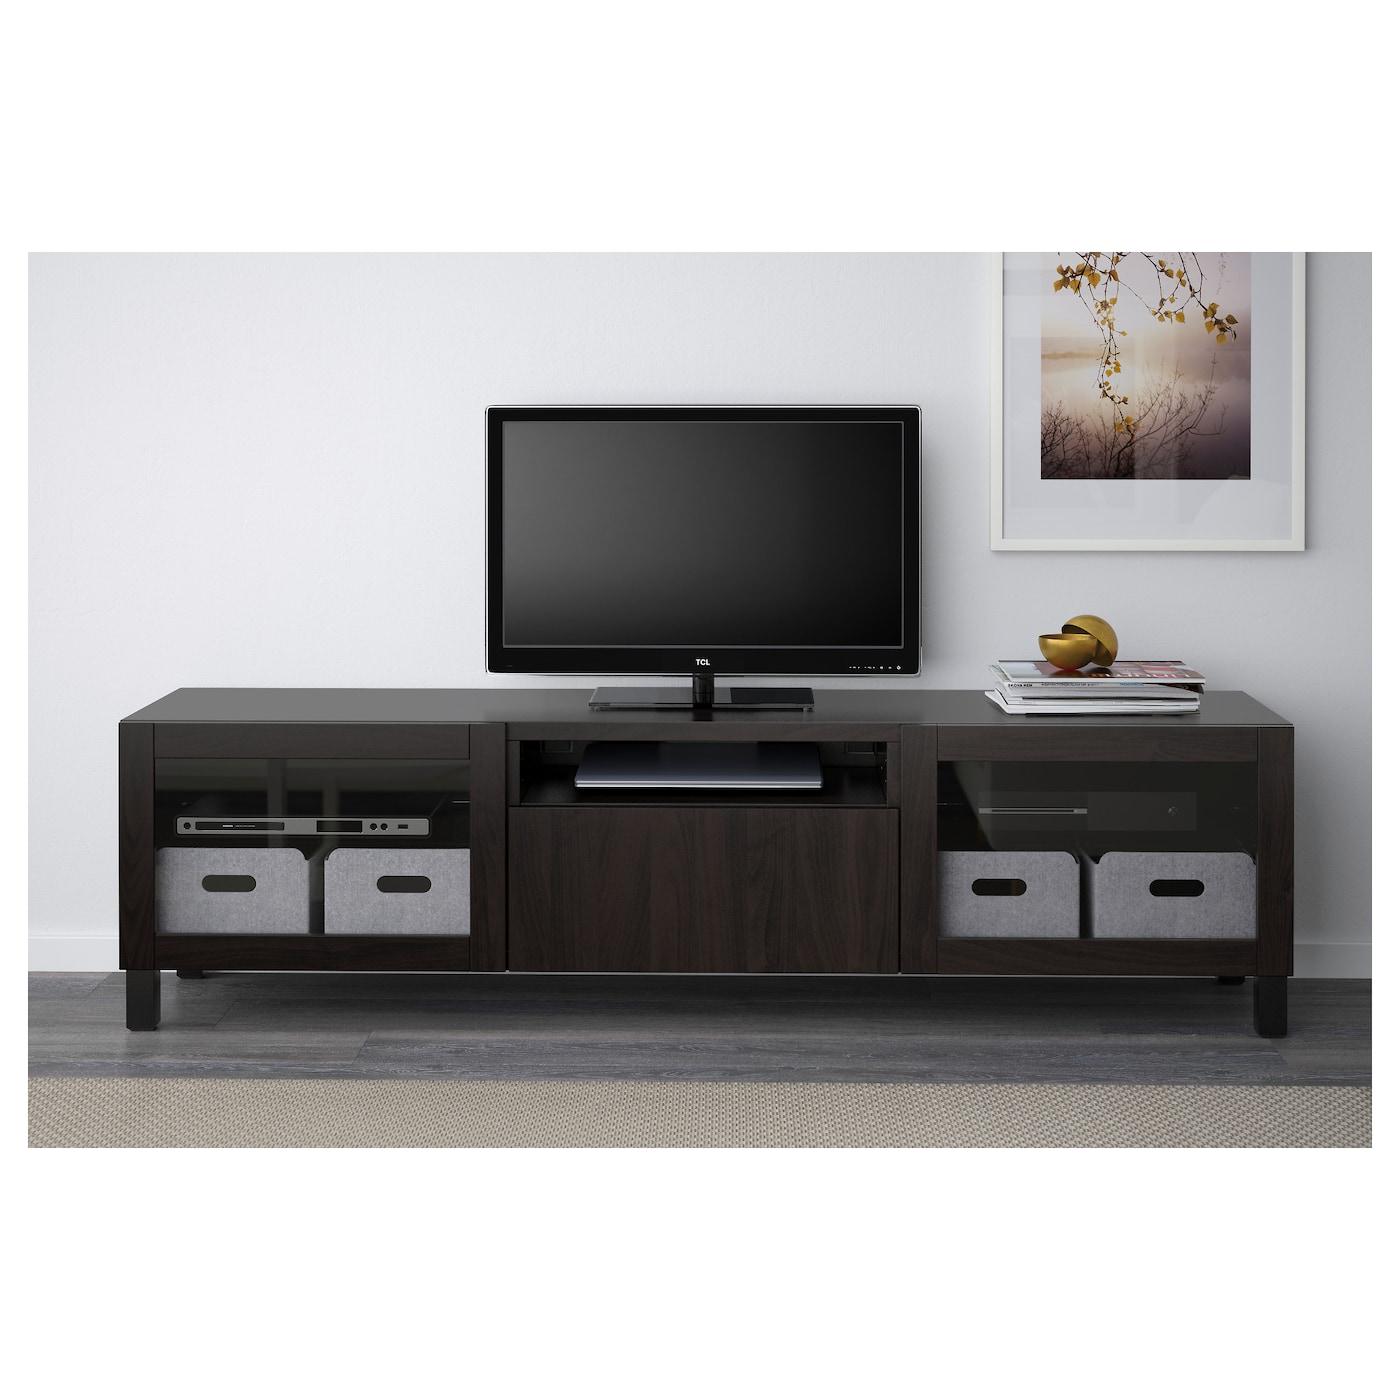 Besta Ikea Cabinet Best 197 Tv Bench Lappviken Sindvik Black Brown Clear Glass